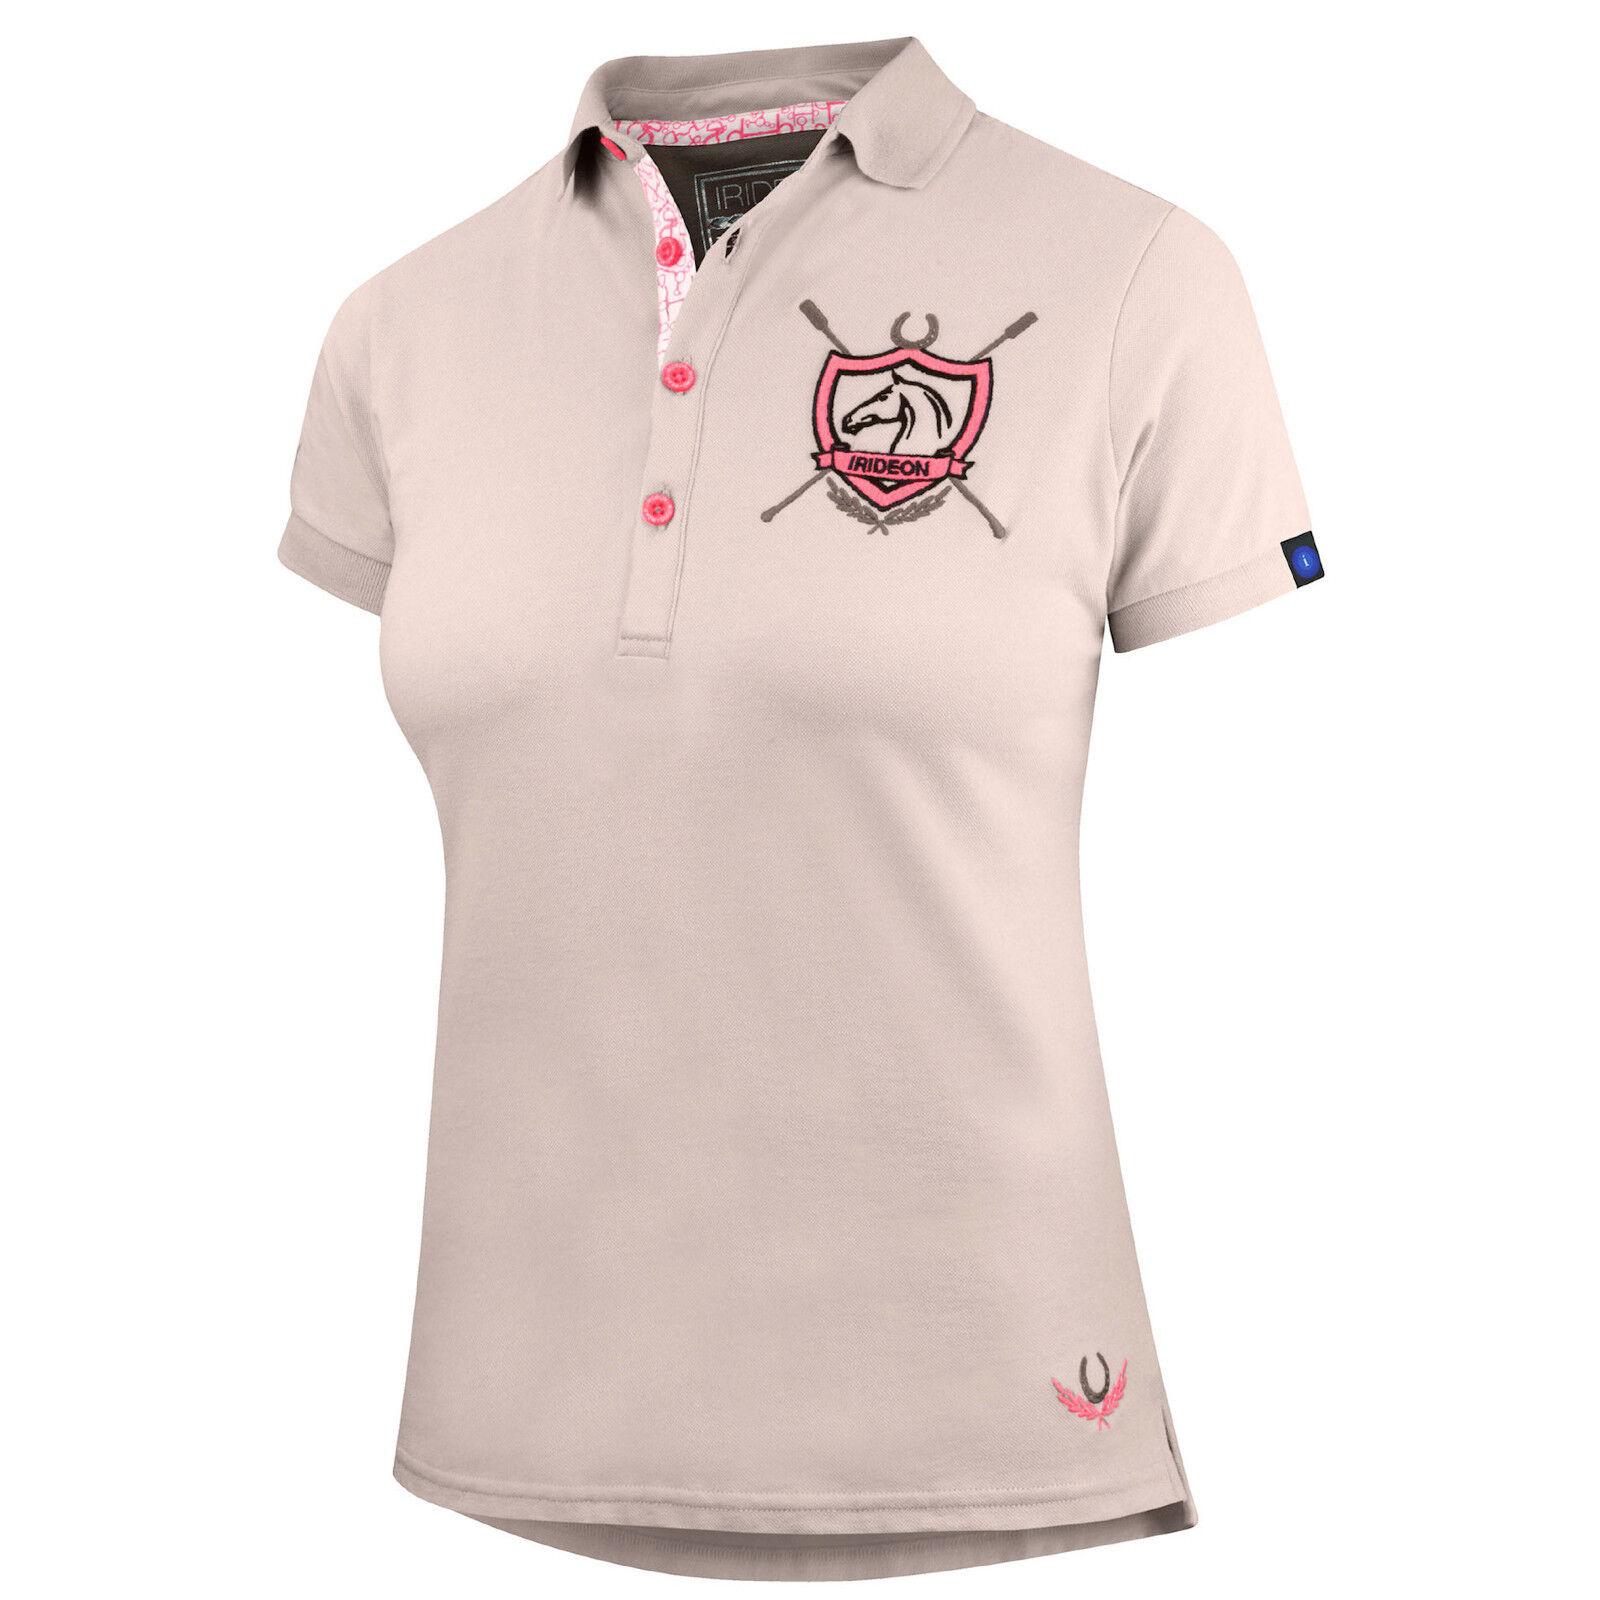 Irideon Women's Princeton Polo Shirt-Oatmeal-XL